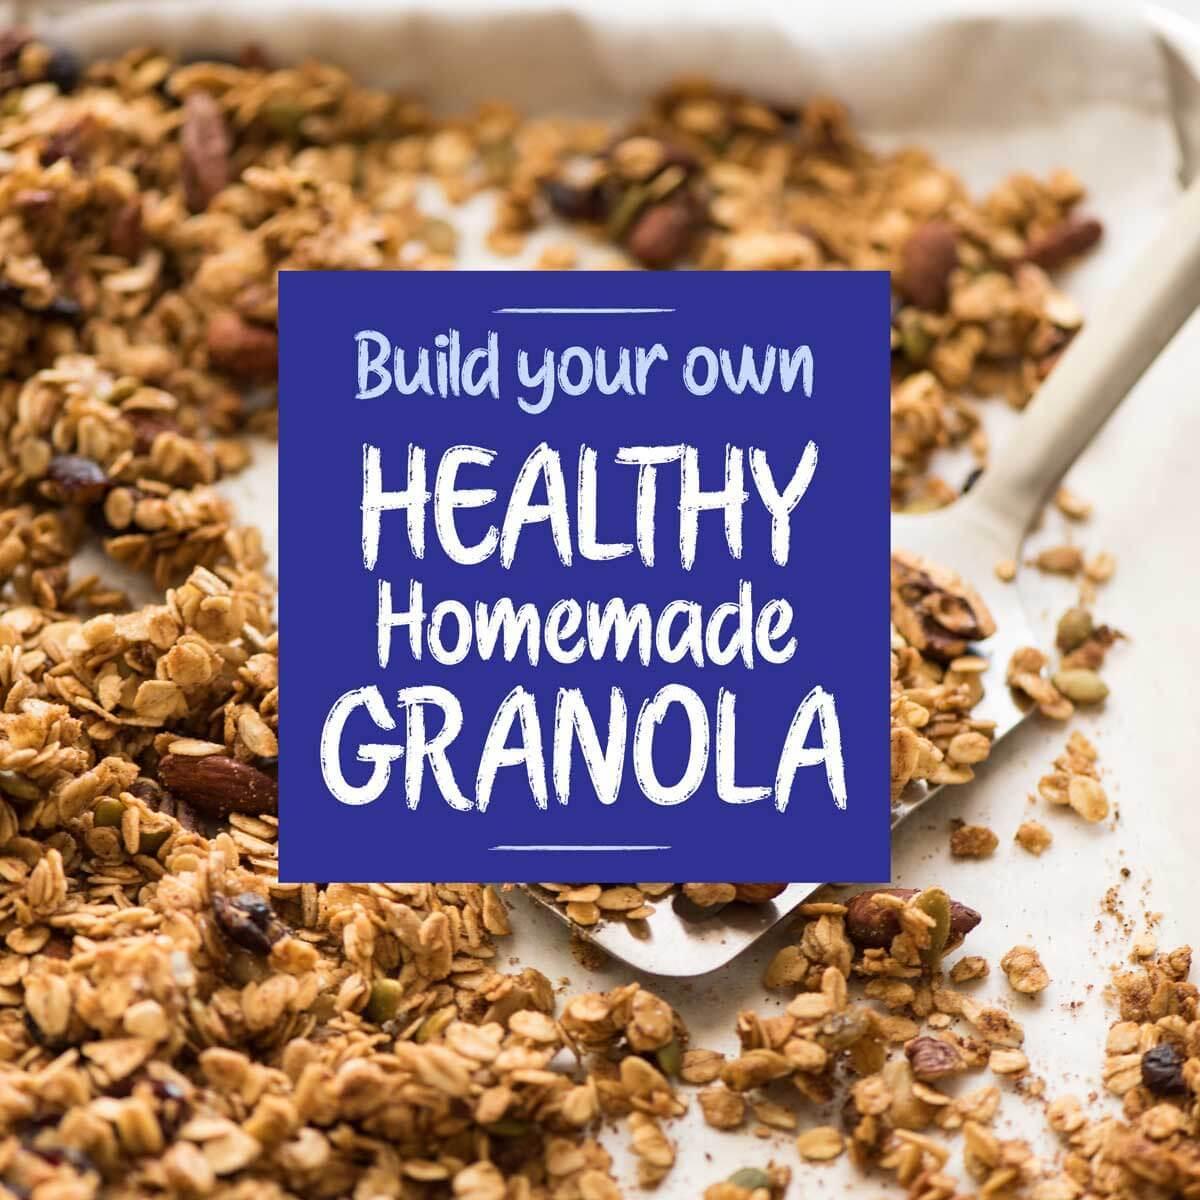 Healthy Homemade Granola - Build Your Own   RecipeTin Eats